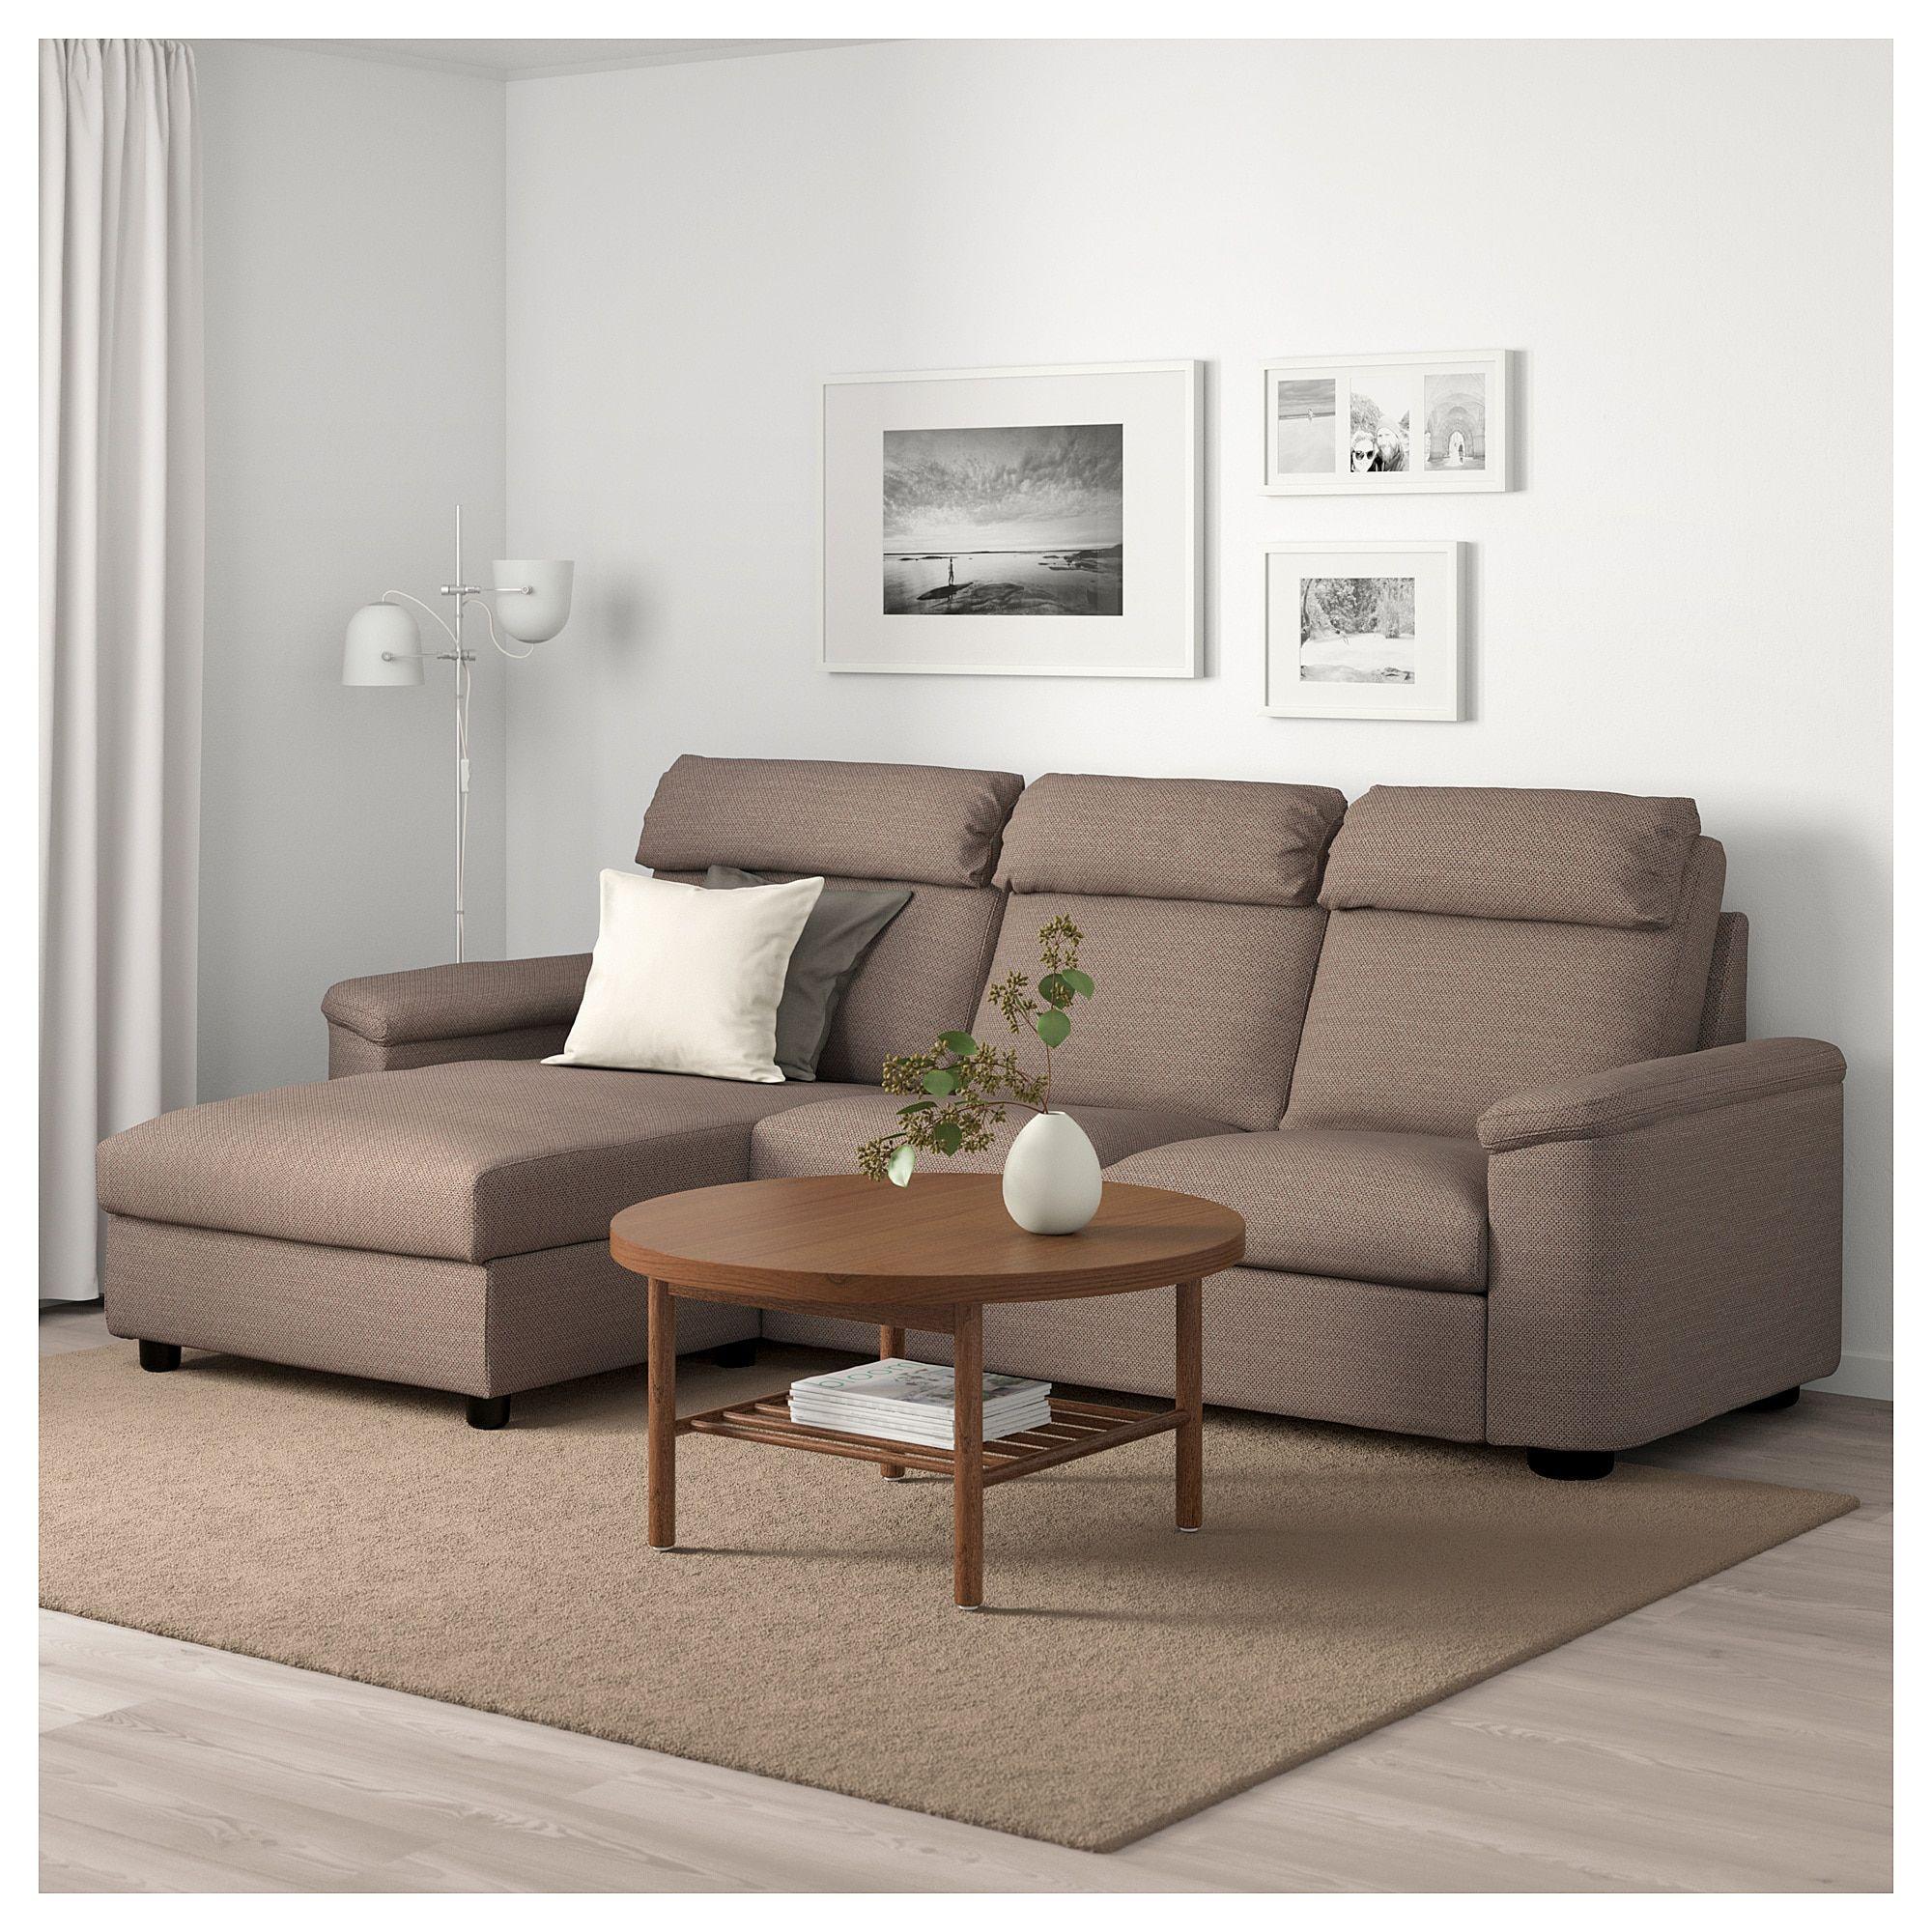 Lidhult Sofa With Chaise Lejde Beige Brown Ikea Sofa Bed Design Sofa Ikea Sofa